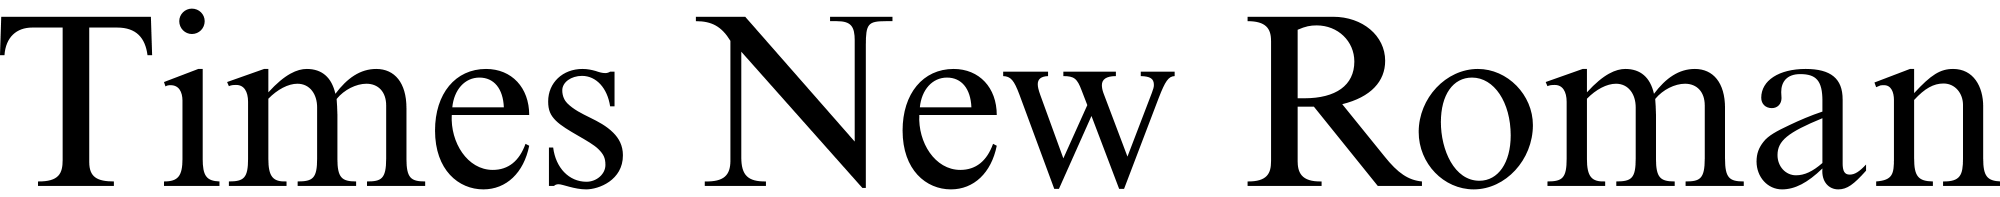 2000px-Times_New_Roman_font.svg.png